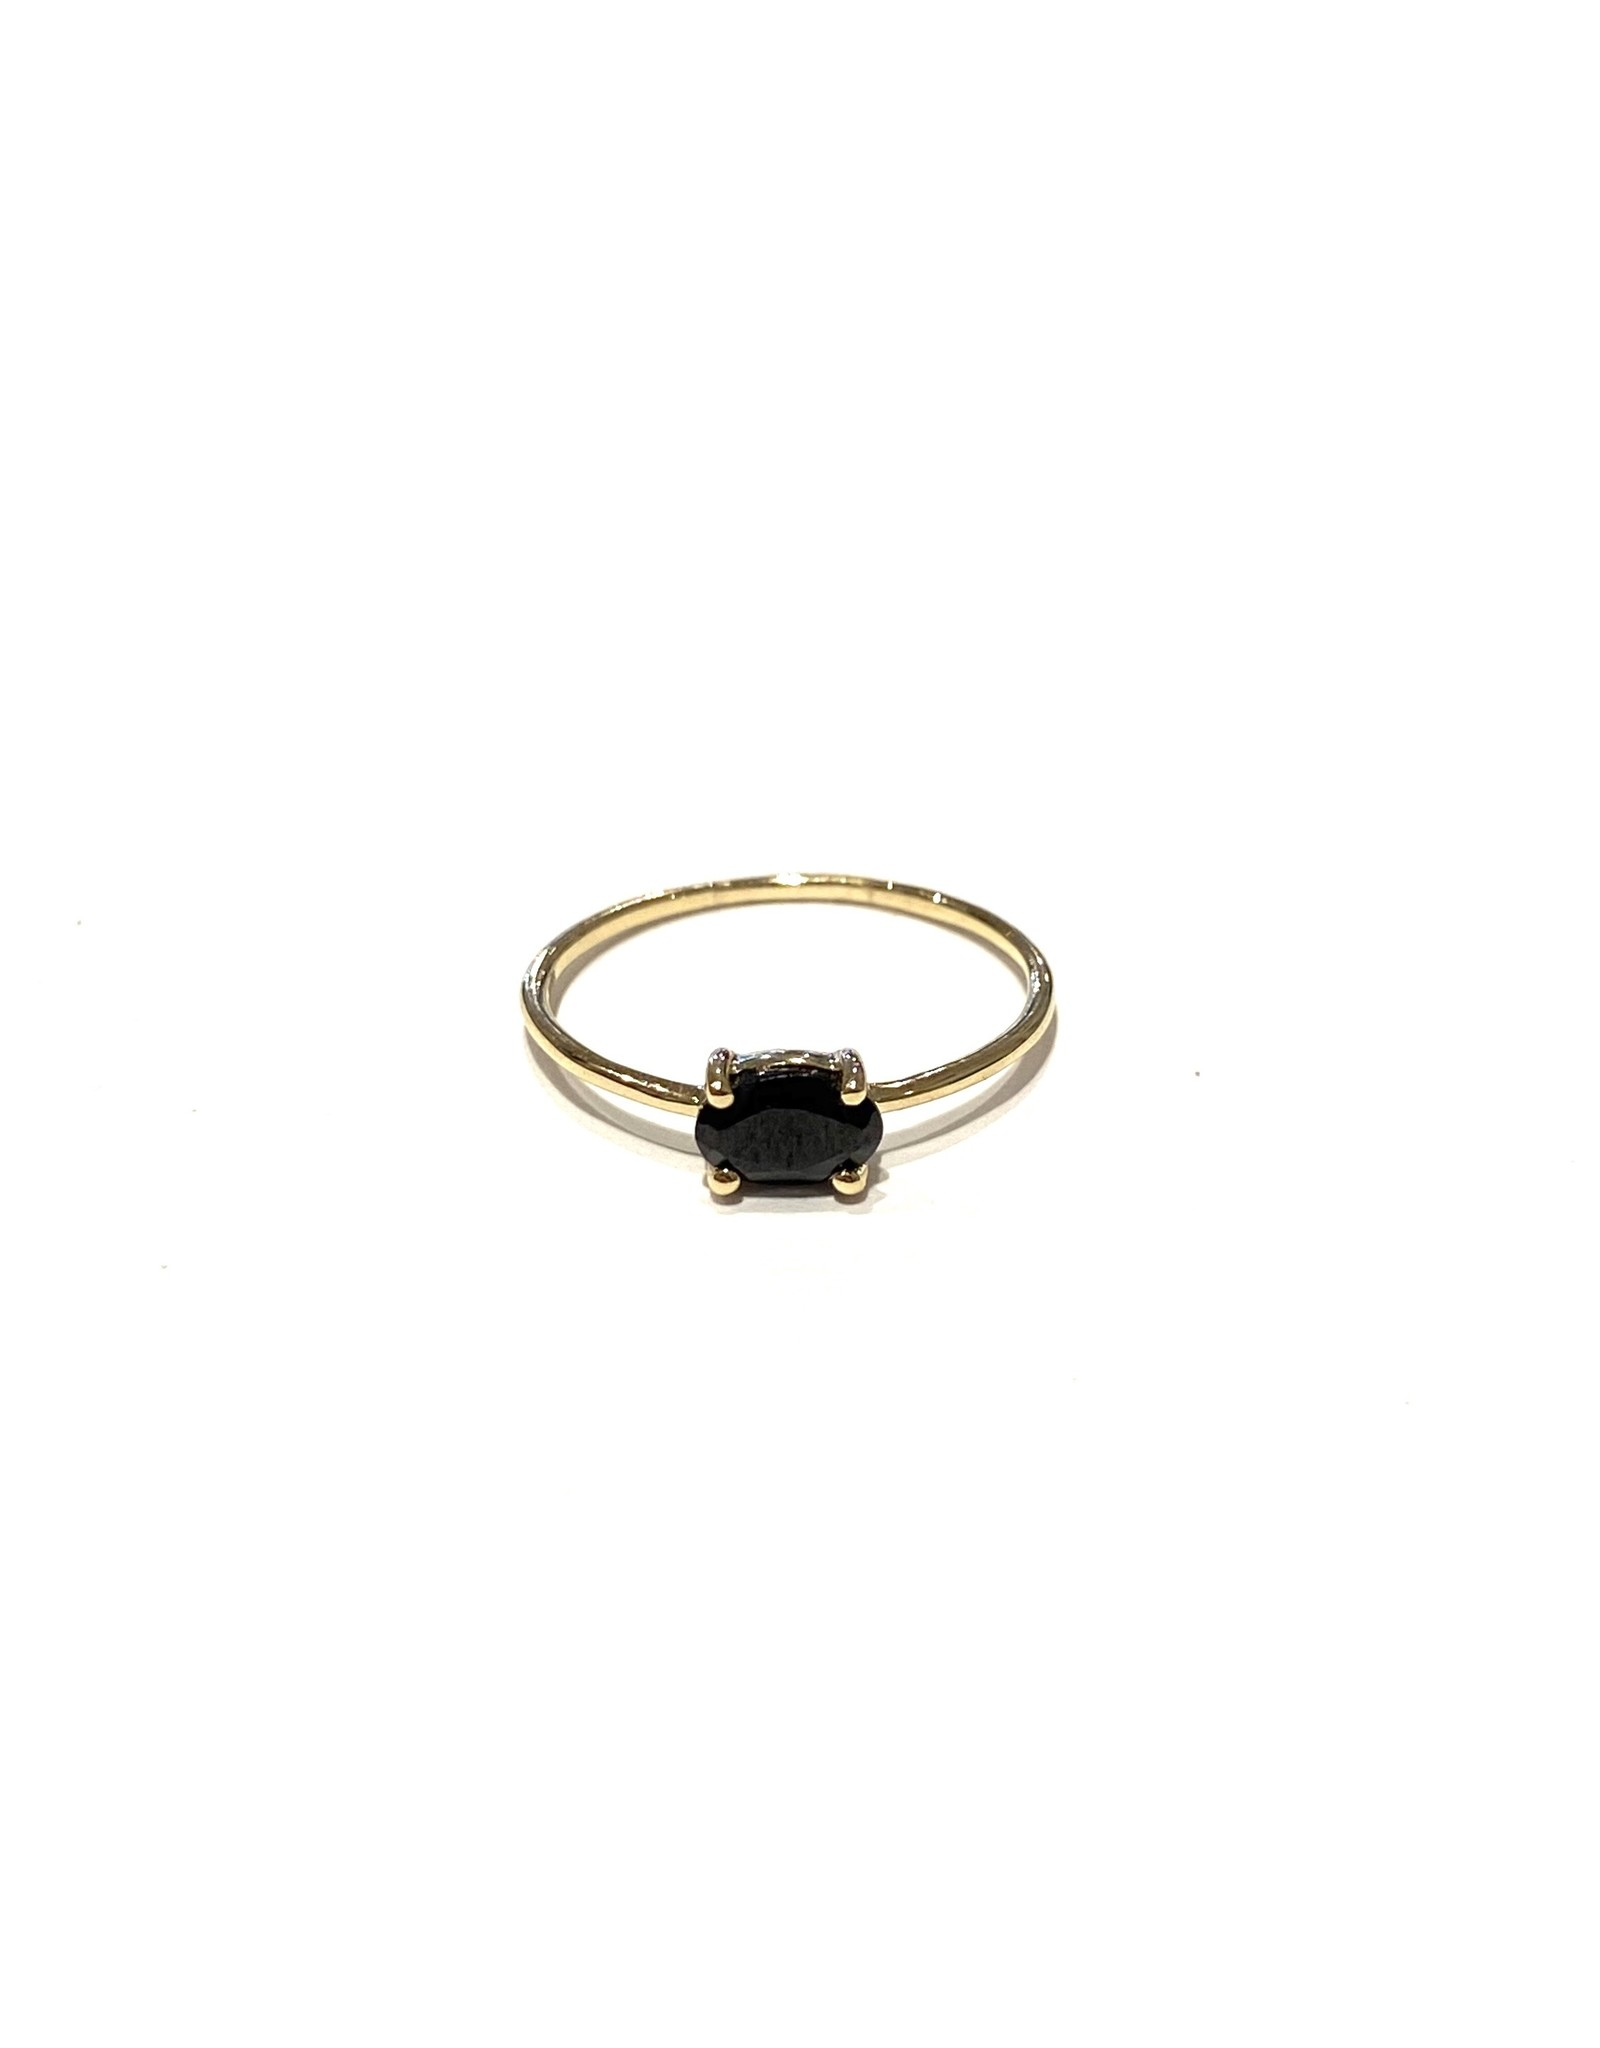 Bo Gold Ring - Goud - Spinel